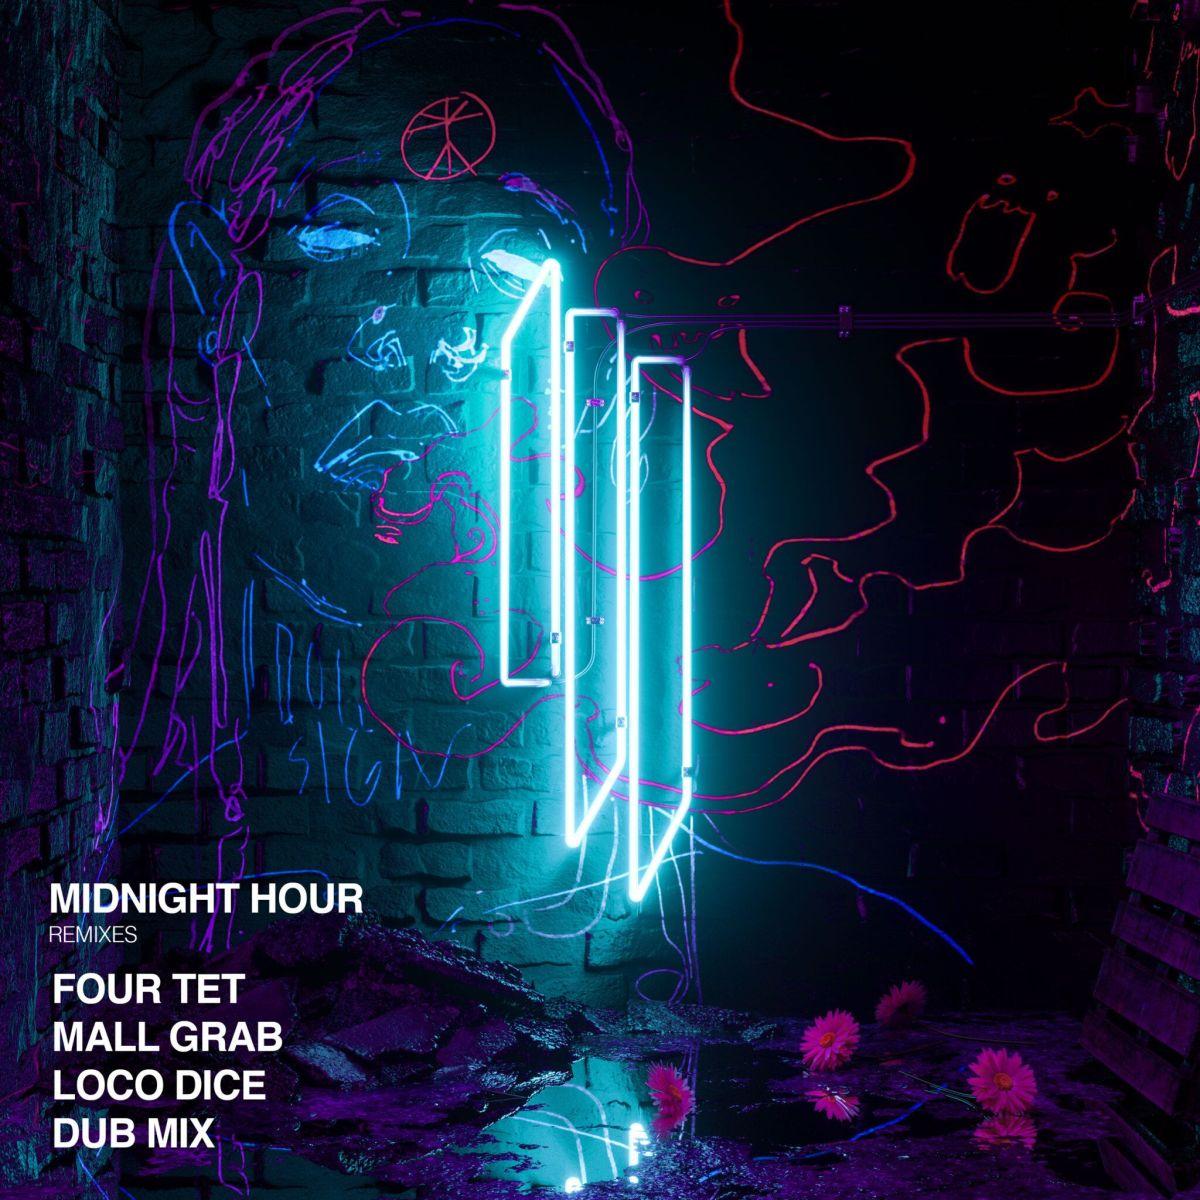 Midnight Hour Remixes Skrillex